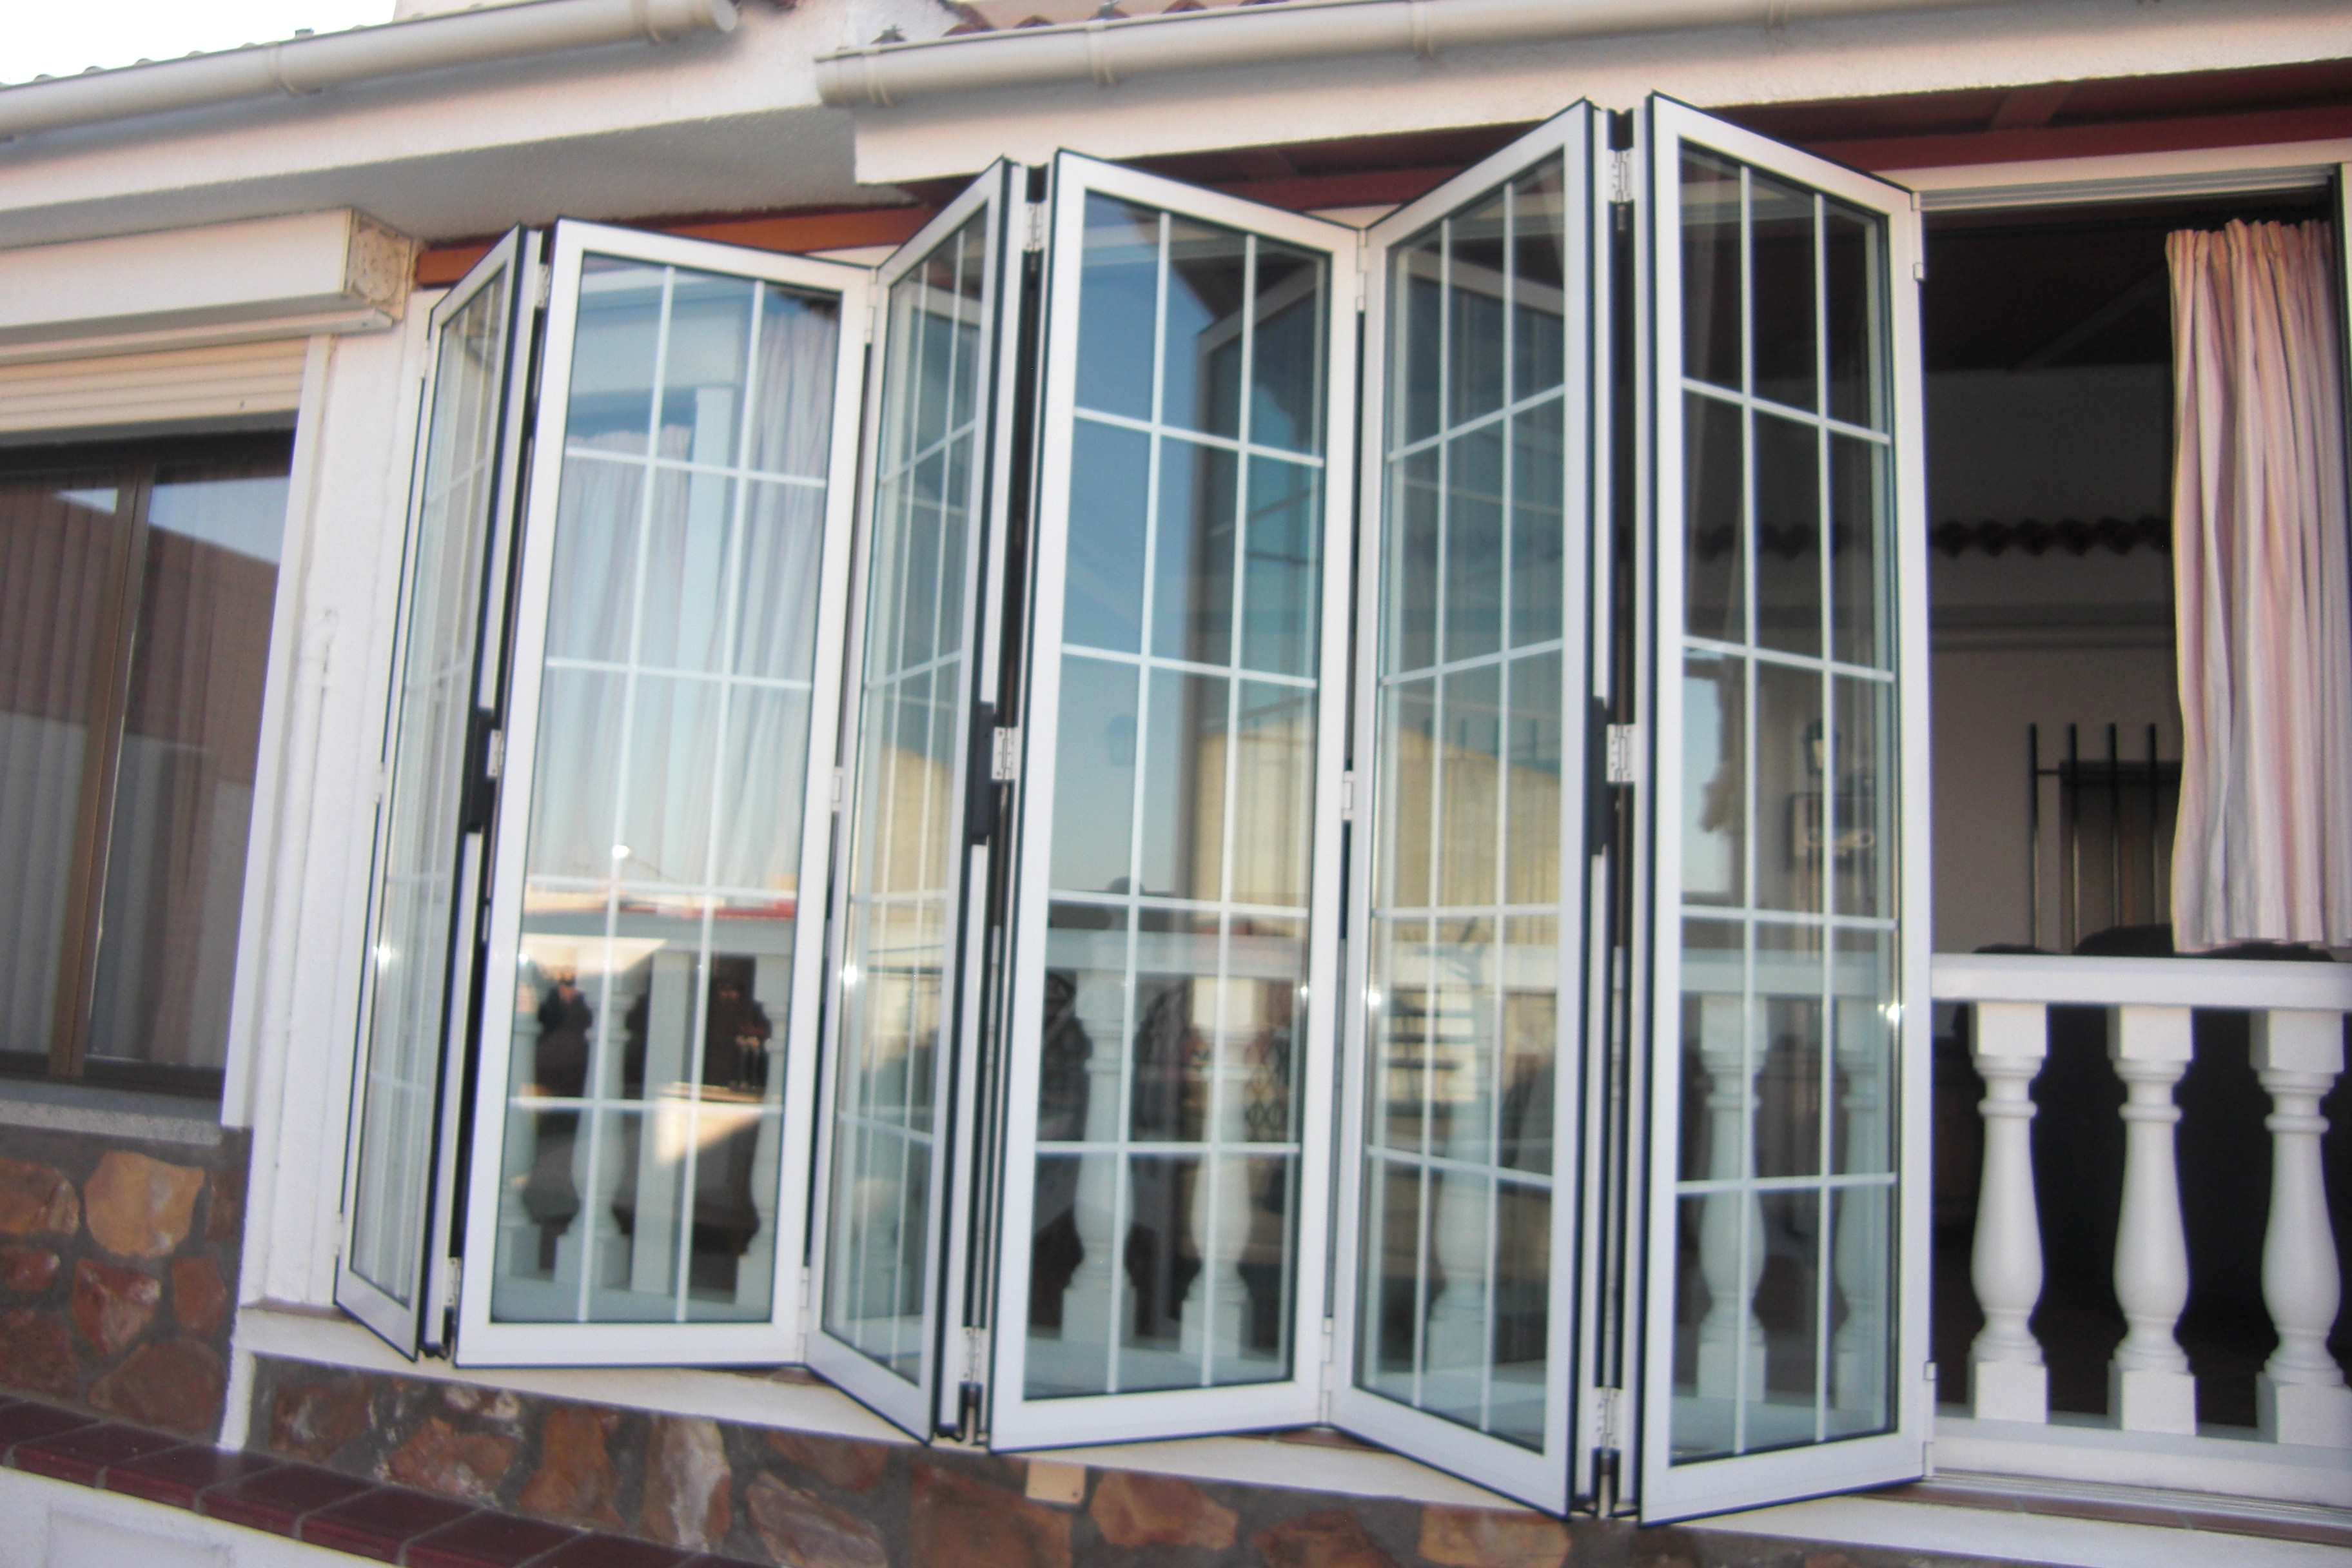 Gu a sobre tipos de apertura de ventanas venakal for Ventanales tipo puerta